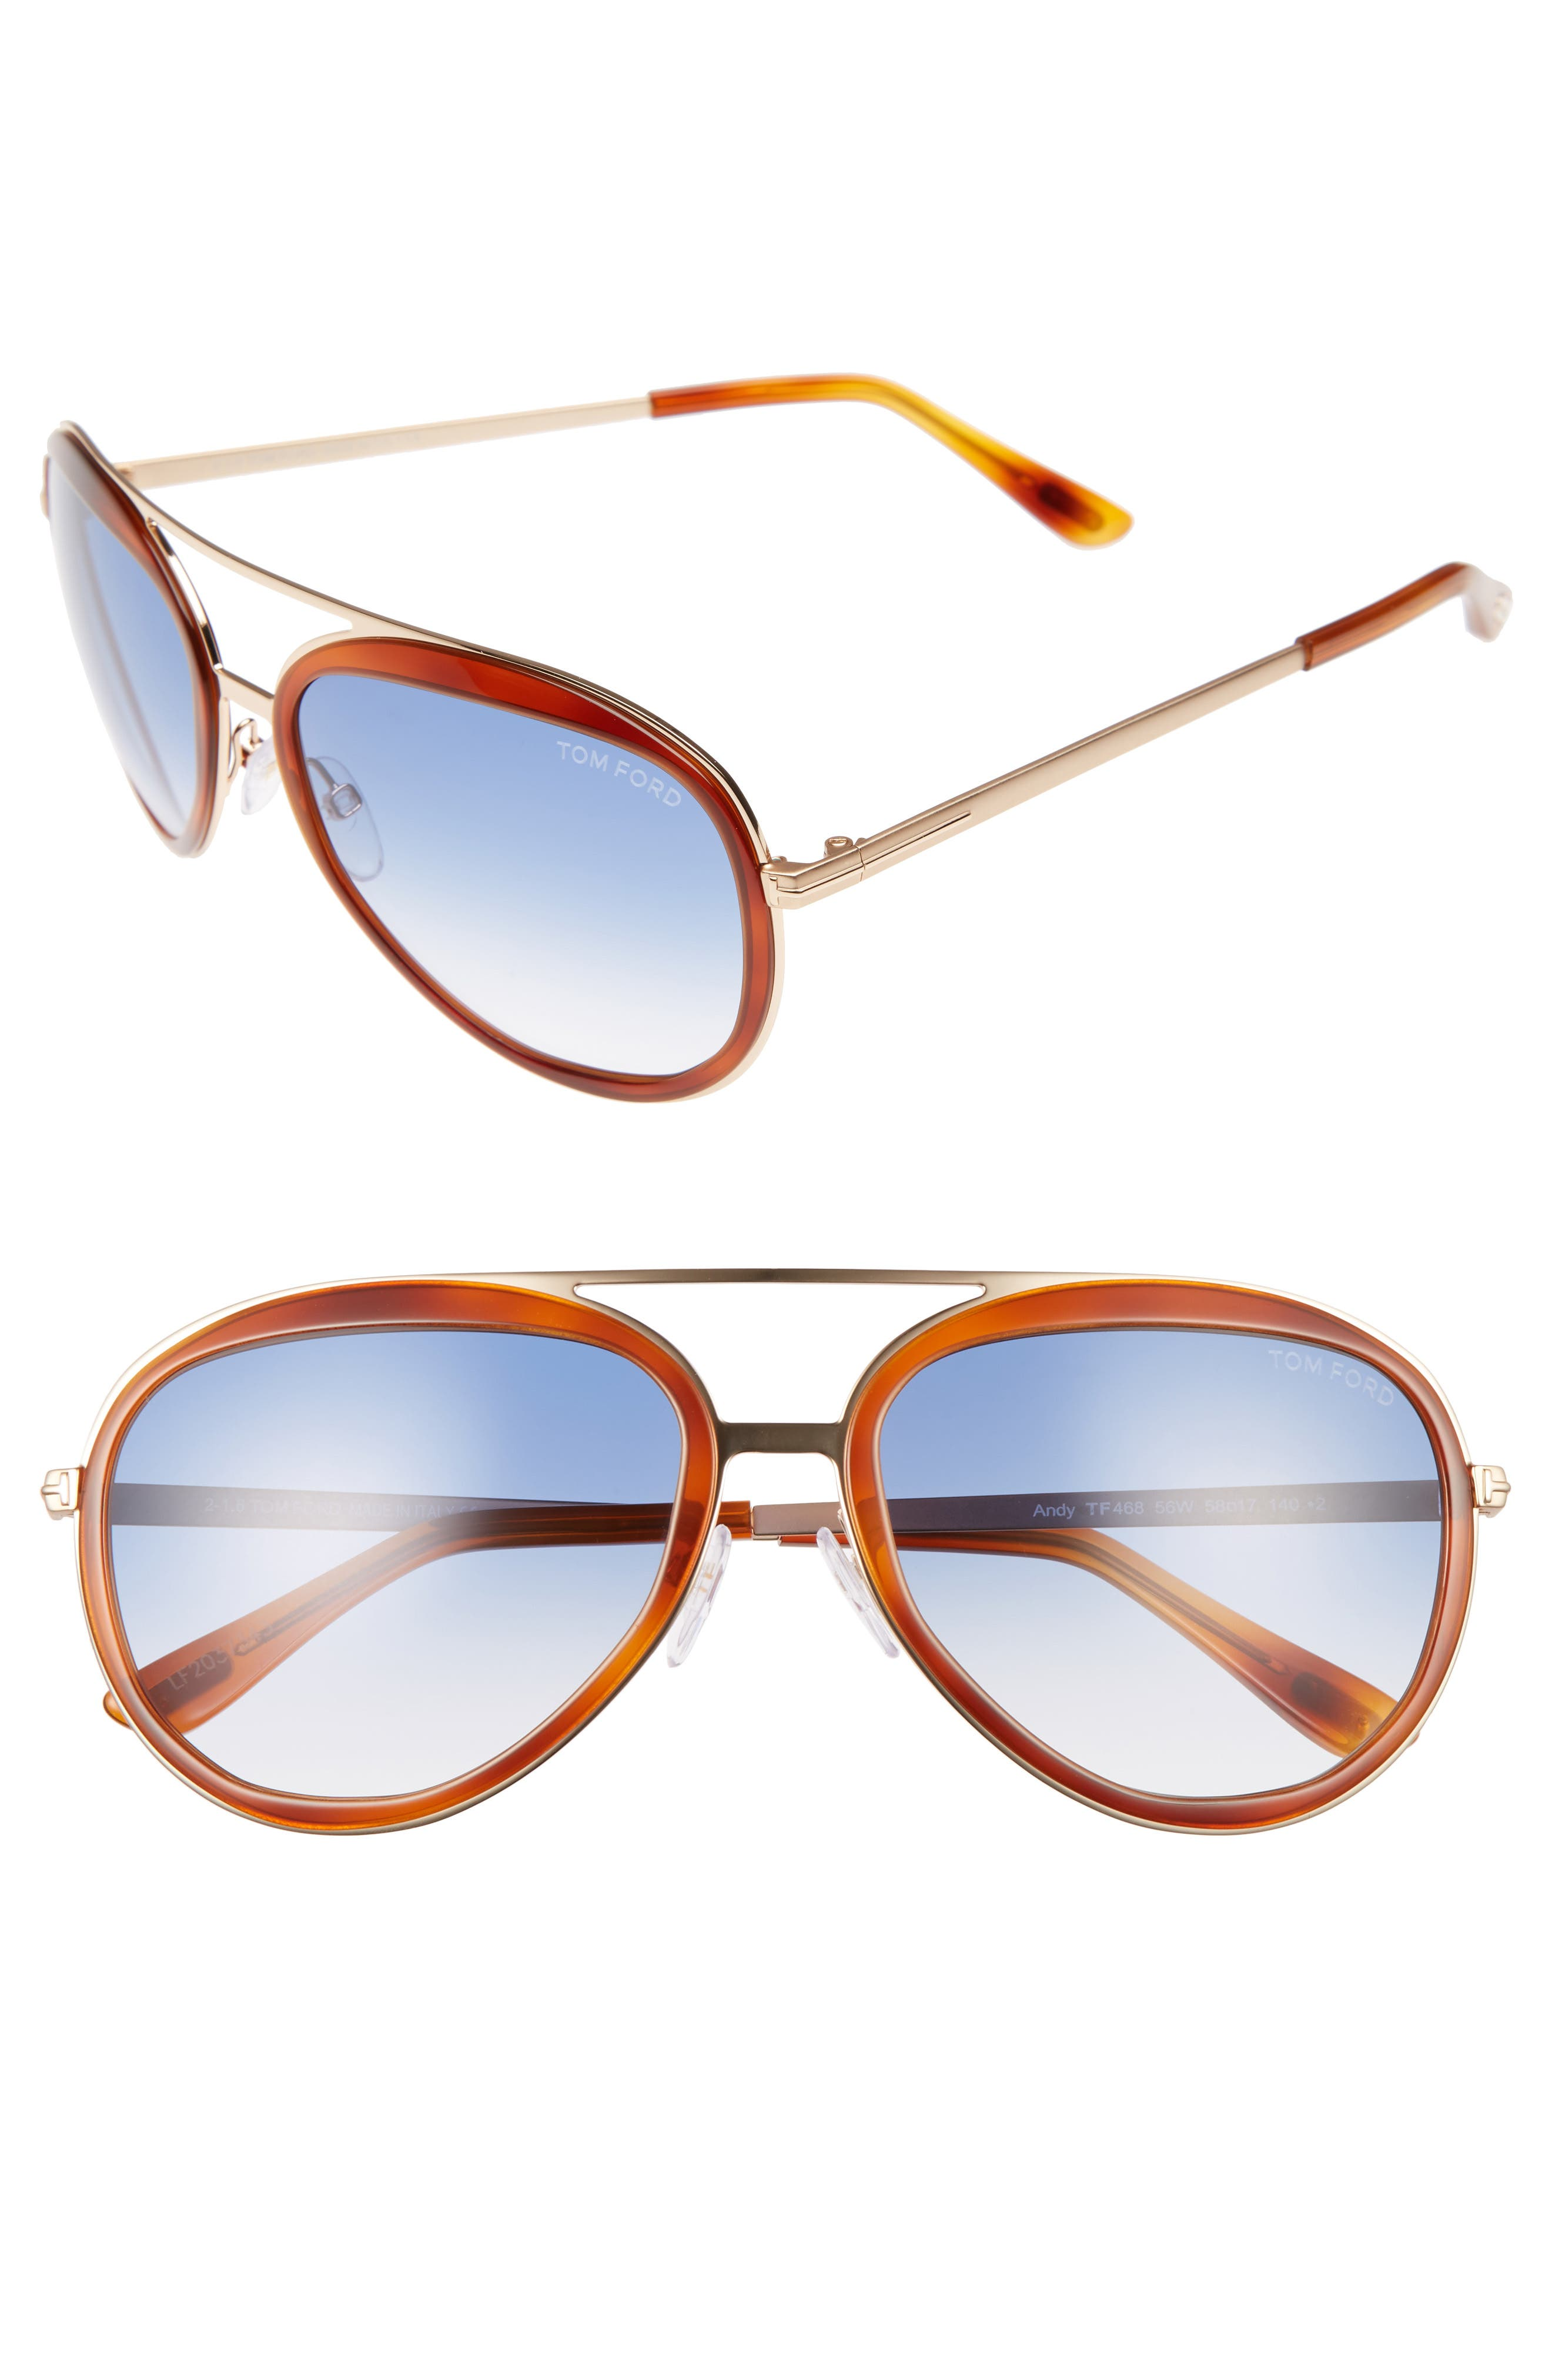 Andy 58mm Aviator Sunglasses,                             Main thumbnail 3, color,